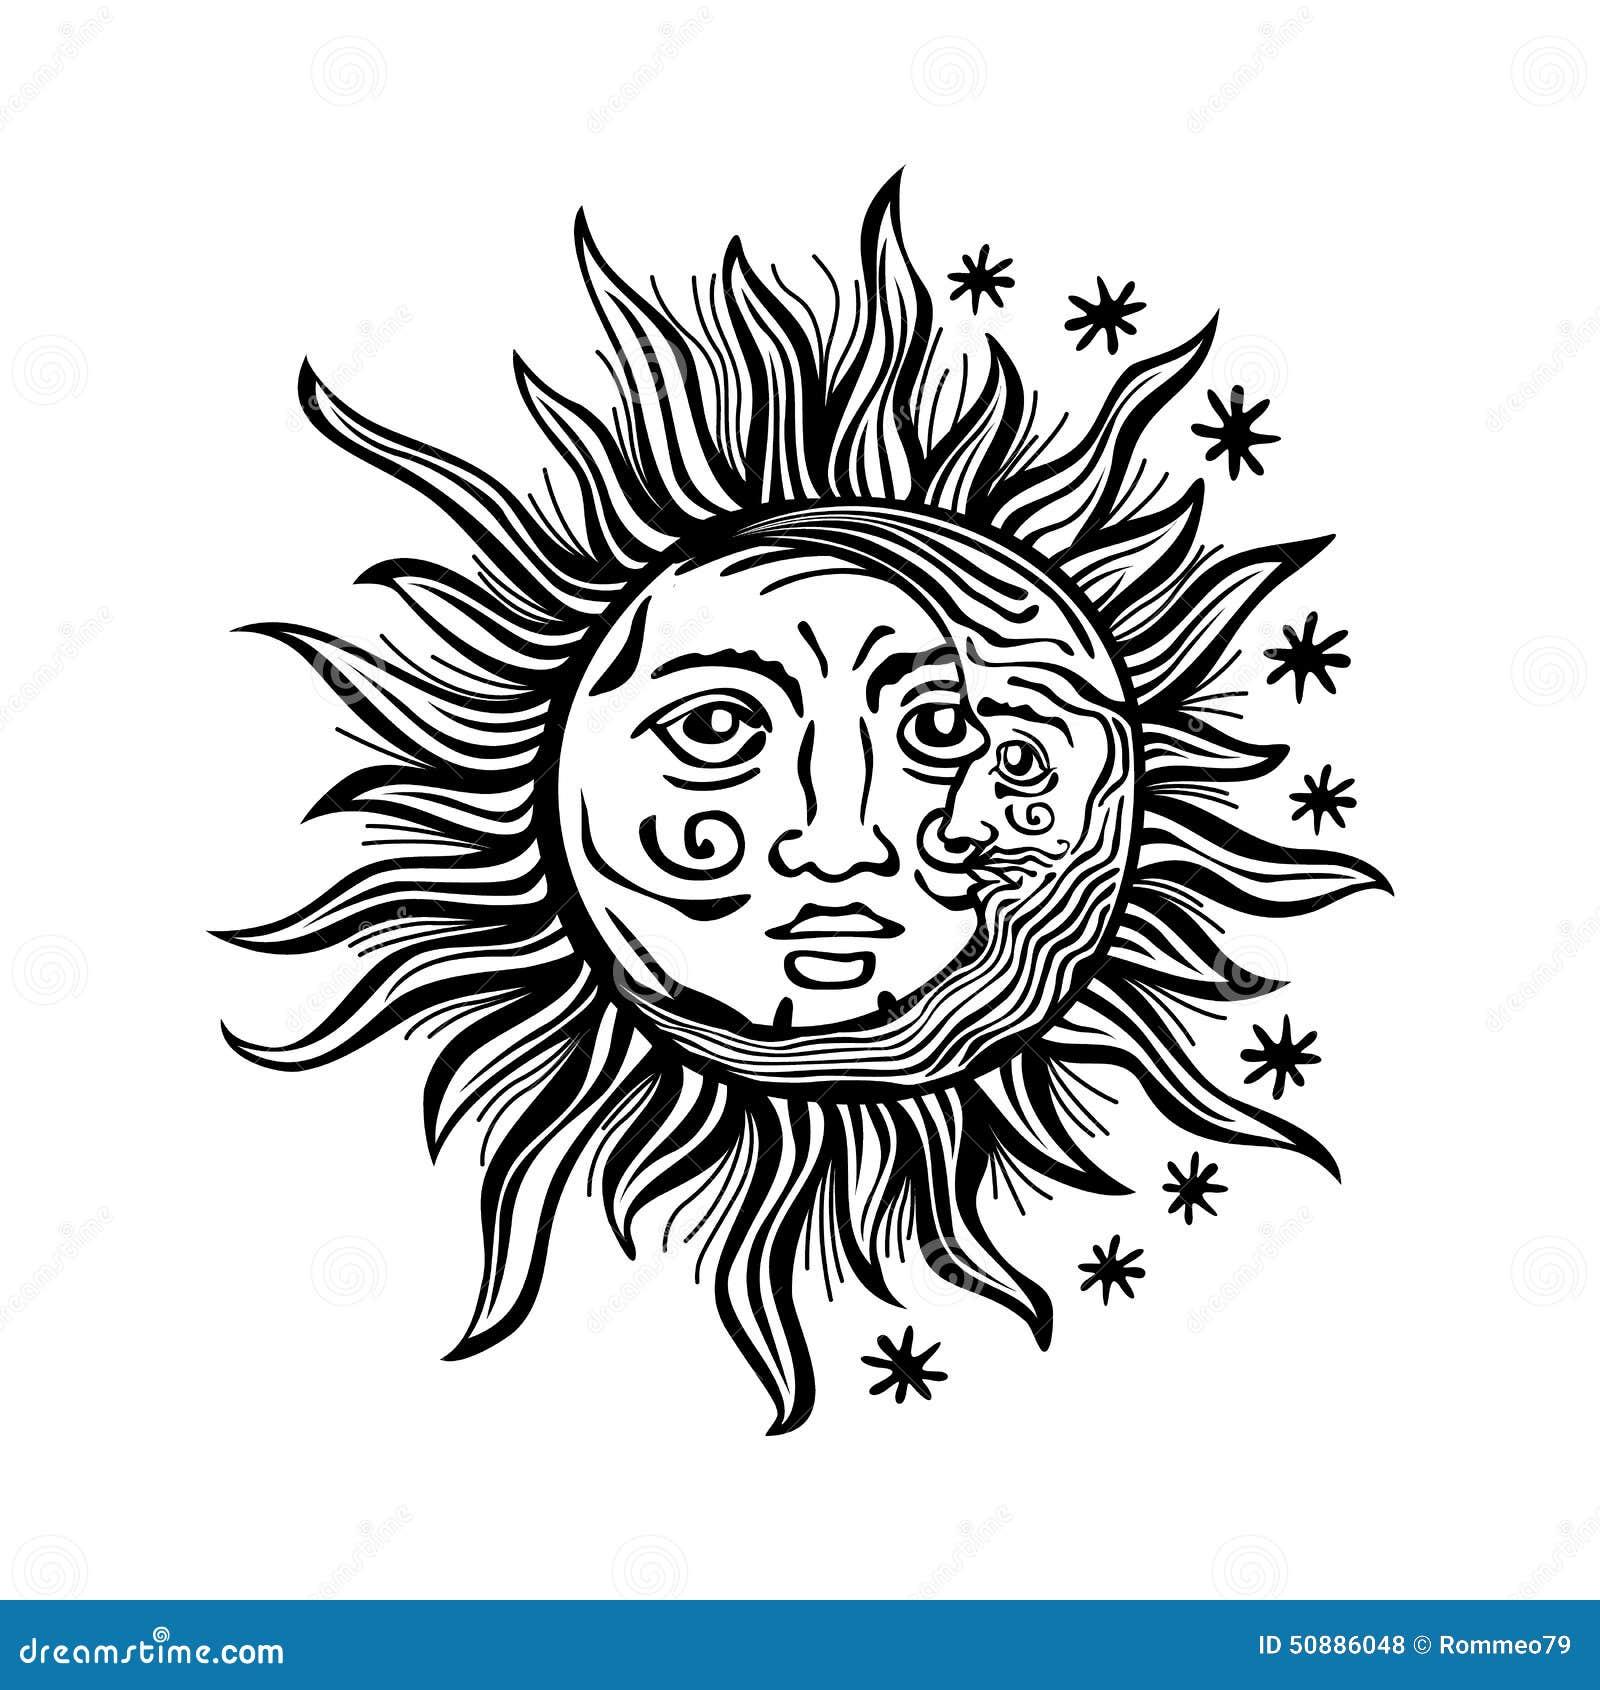 Line Drawing Sun Vector : Illustration sun moon star human faces retro vintage